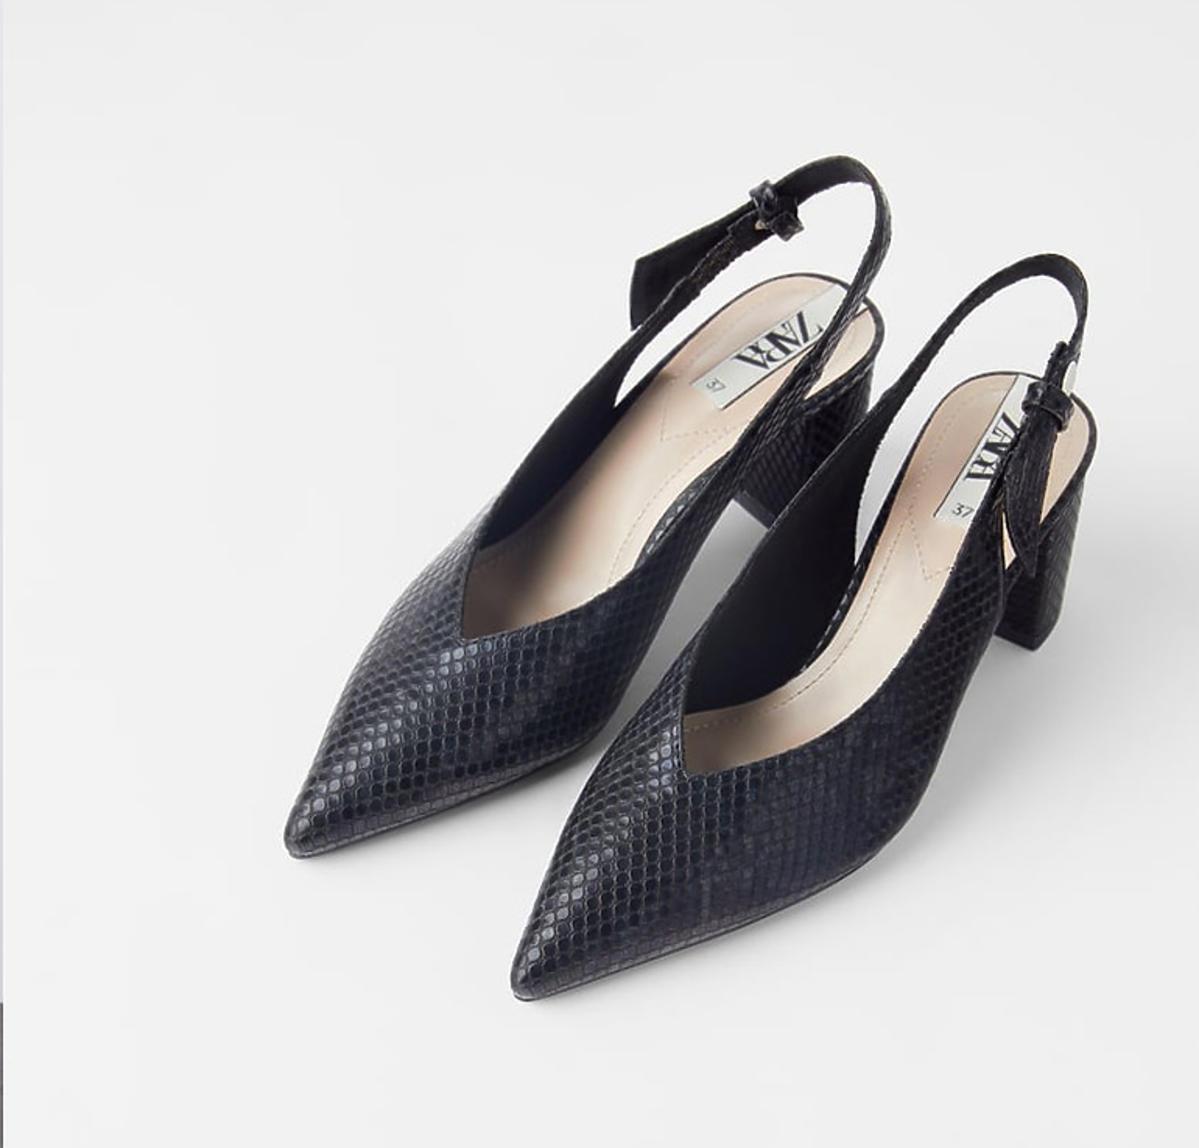 Buty na obcasie z odkrytą piętą